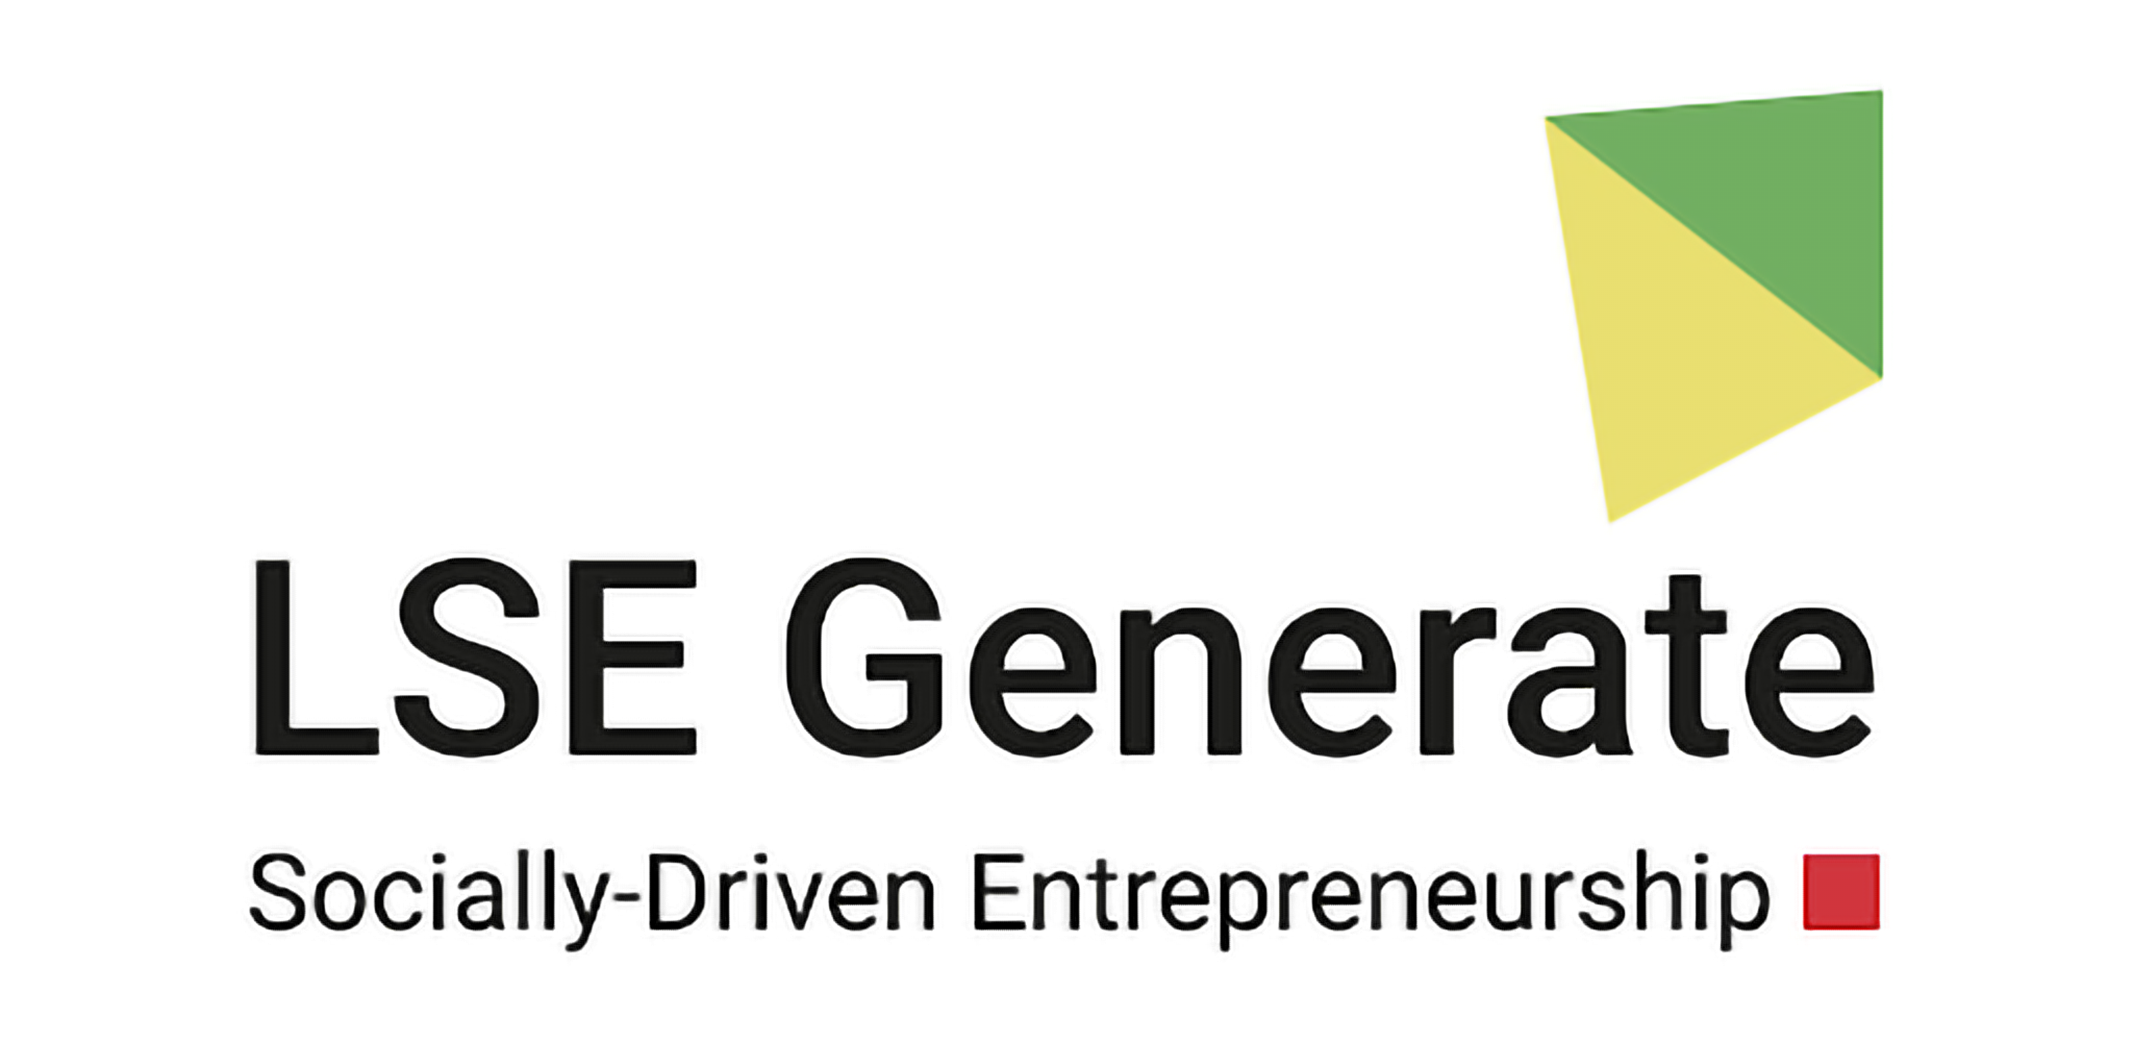 lse_generate